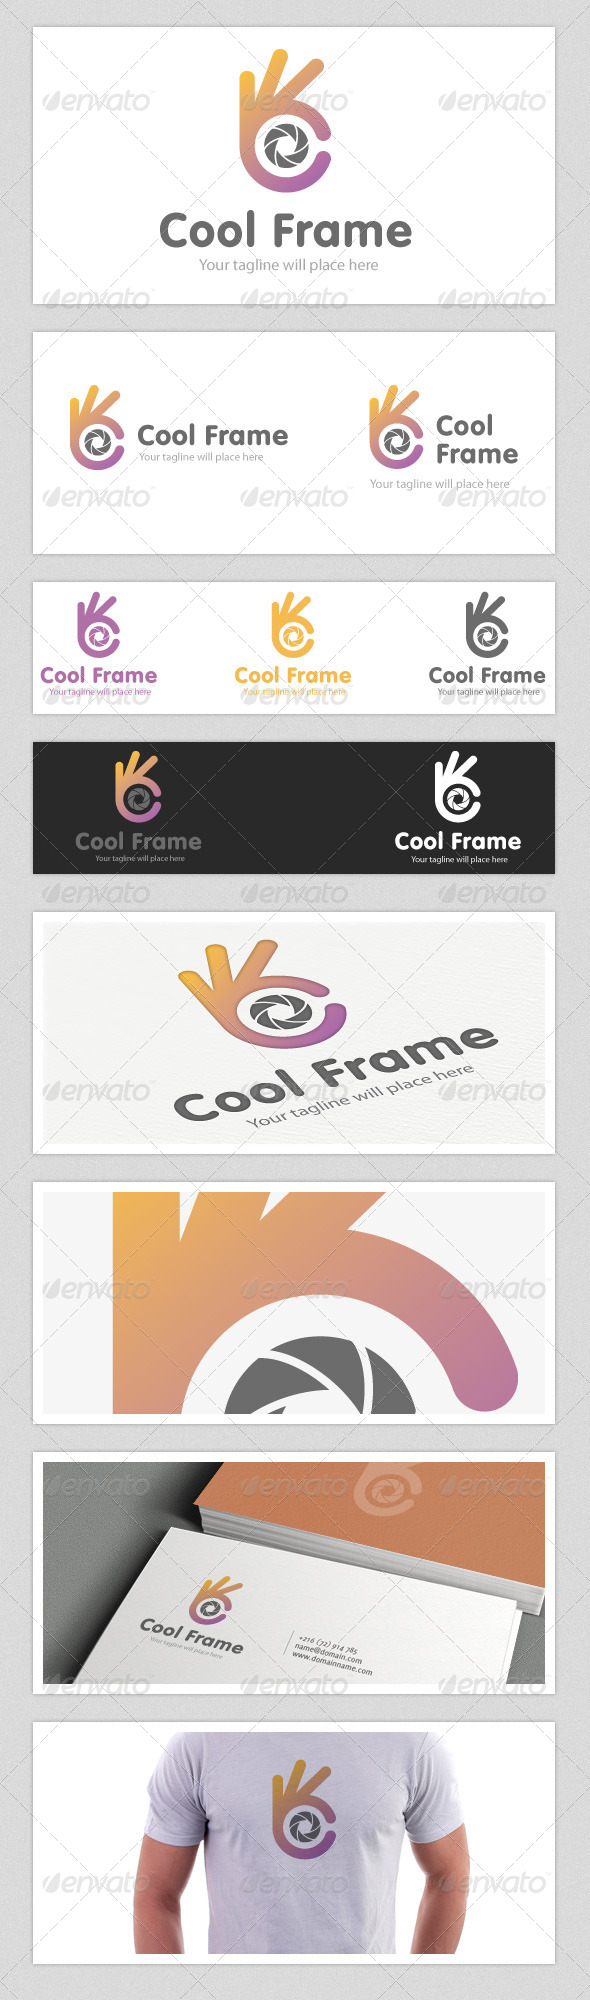 Cool Frame Logo - Vector Abstract